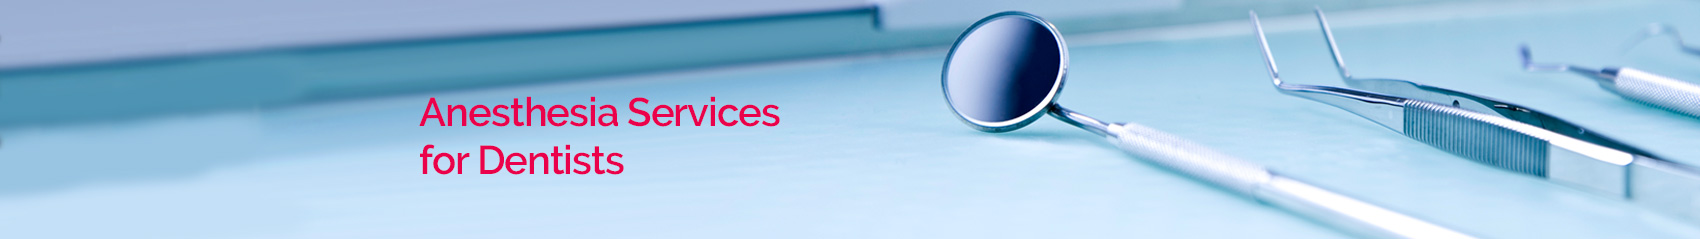 Dental Anesthesia Services